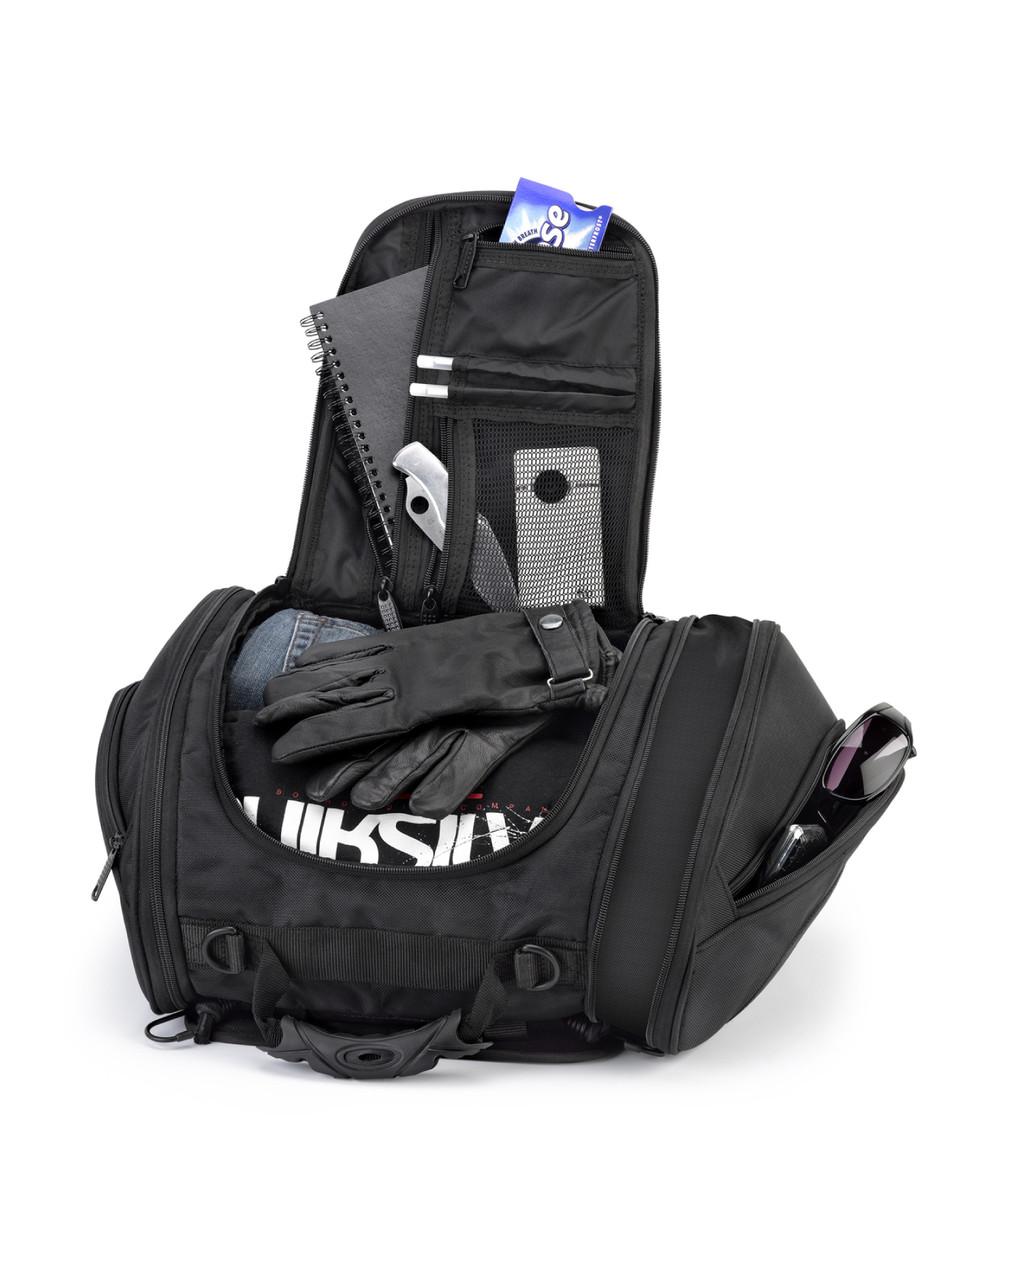 Kawasaki Viking Sport Motorcycle Tail Bag Storage View